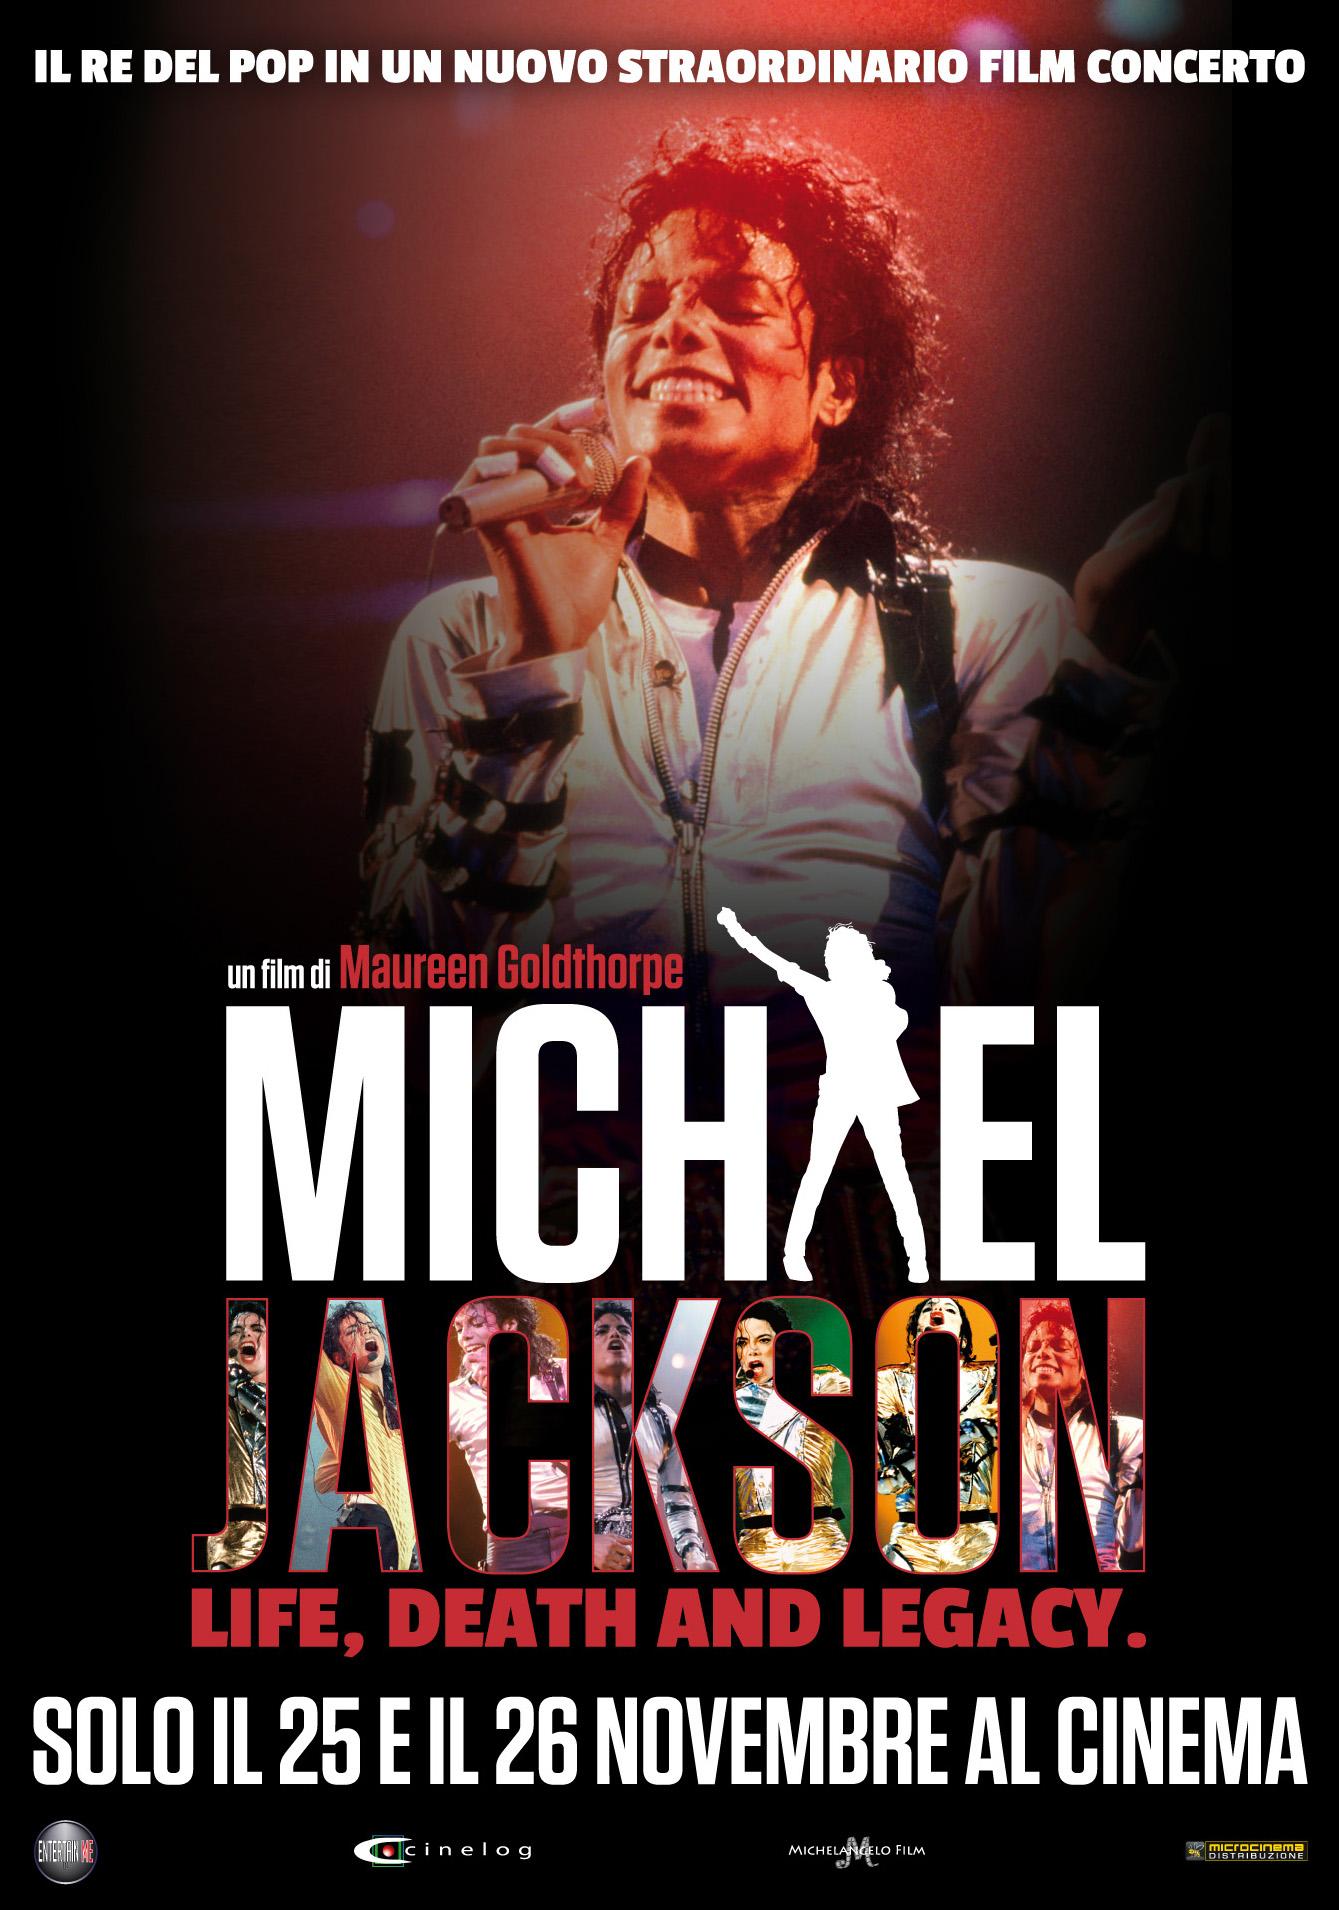 Locandina di Michael Jackson – Life Death and Legacy